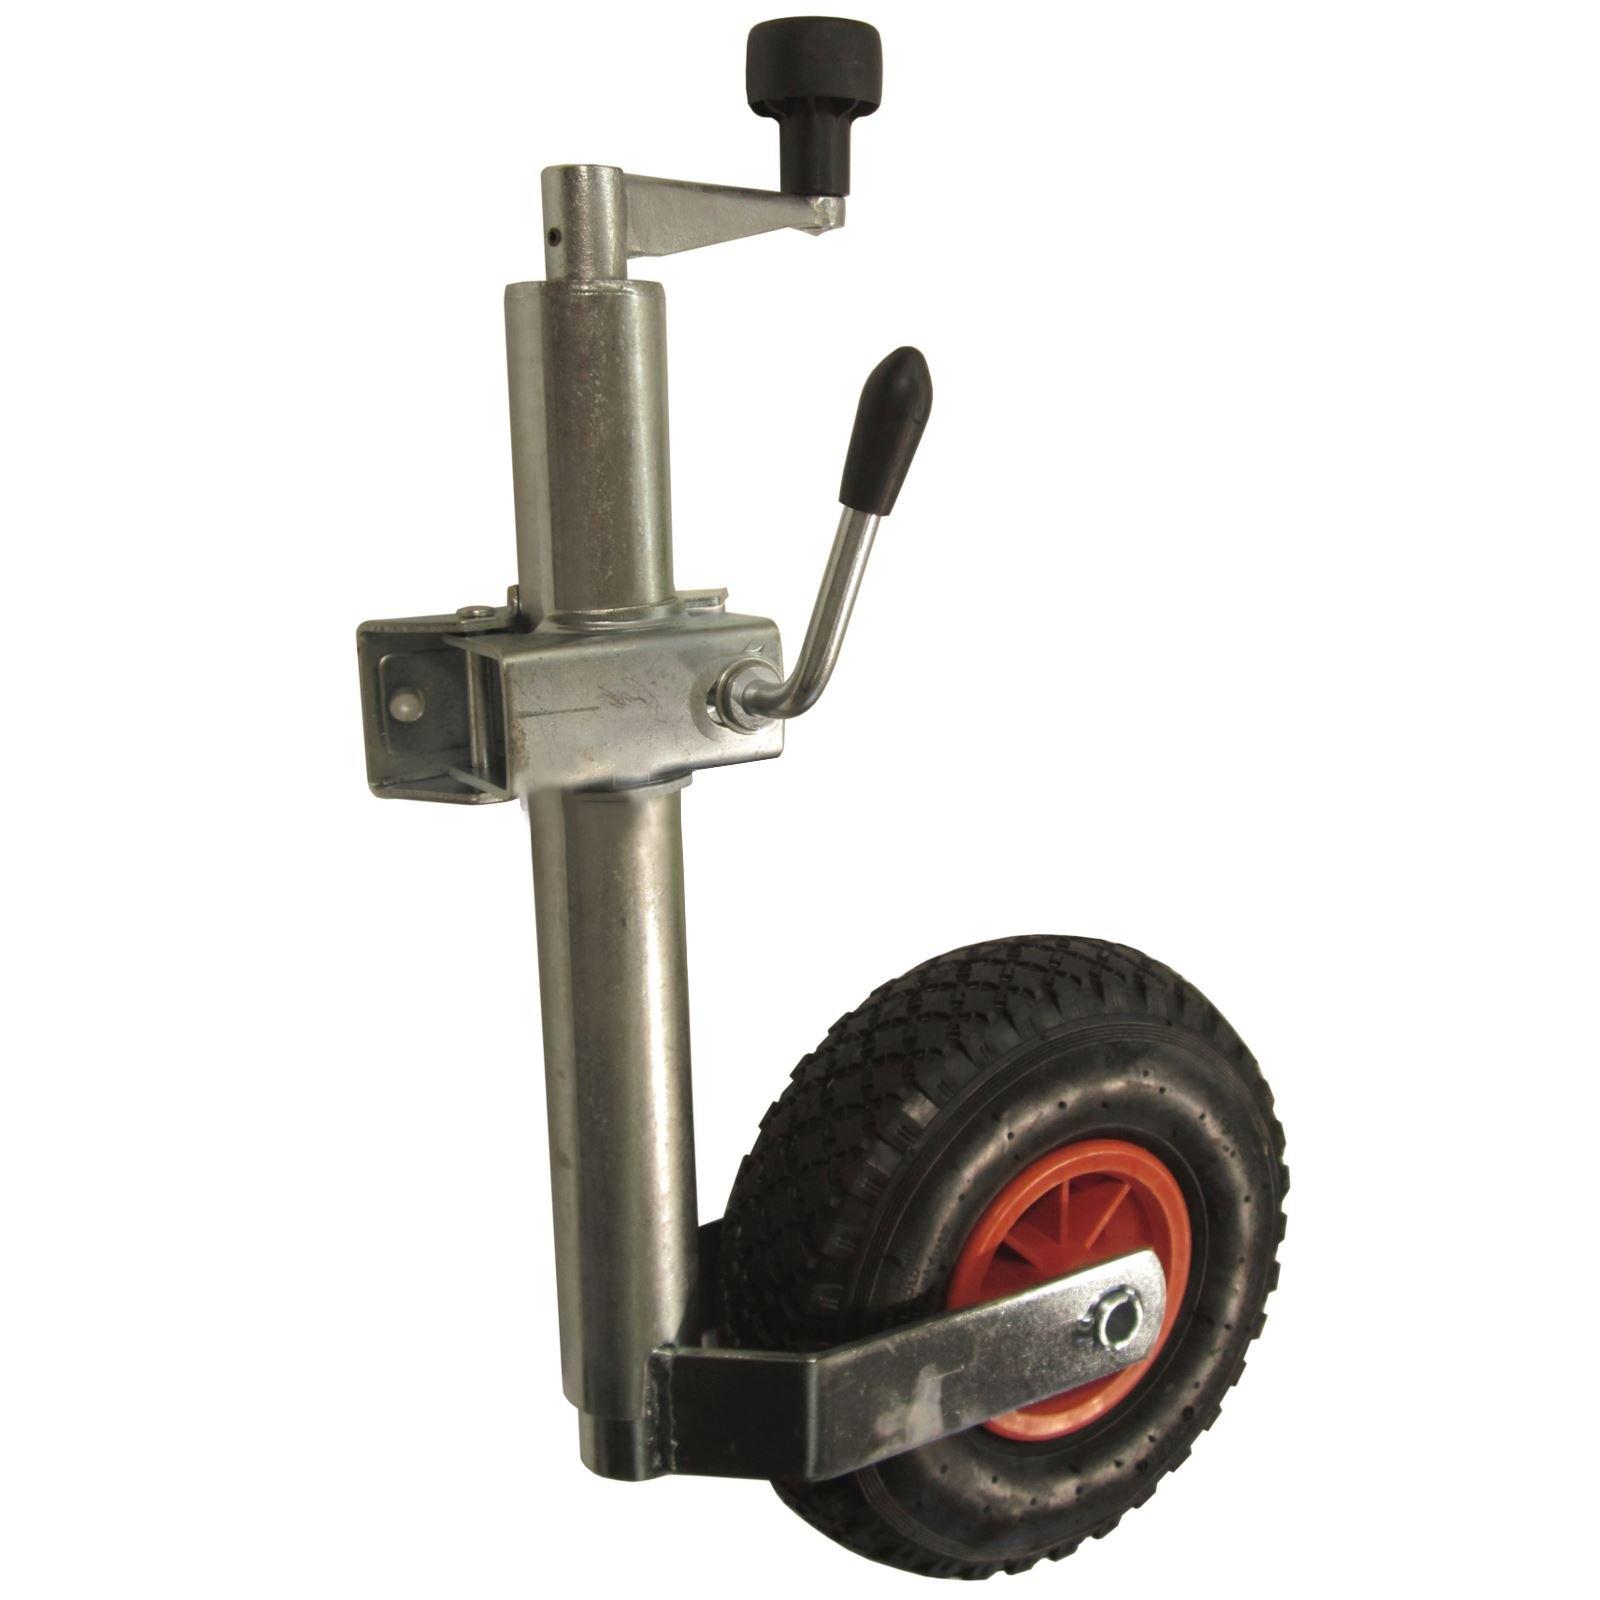 AB Tools-Maypole Heavy Duty Pneumatic Jockey Wheel and clamp (48MM) TR005 by AB Tools-Maypole